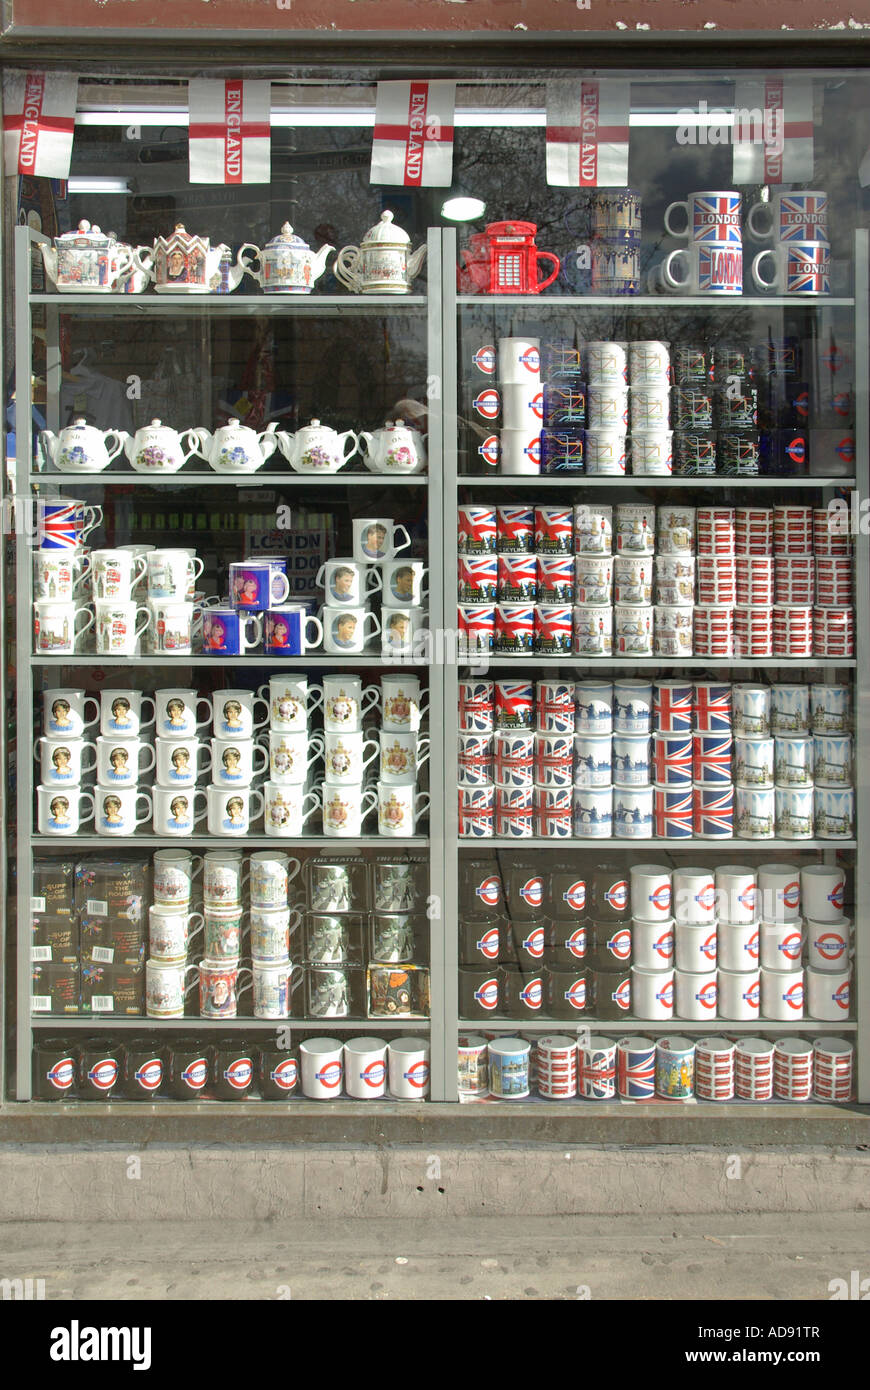 close up of london souvenir shop window display including mugs stock photo 13344310 alamy. Black Bedroom Furniture Sets. Home Design Ideas